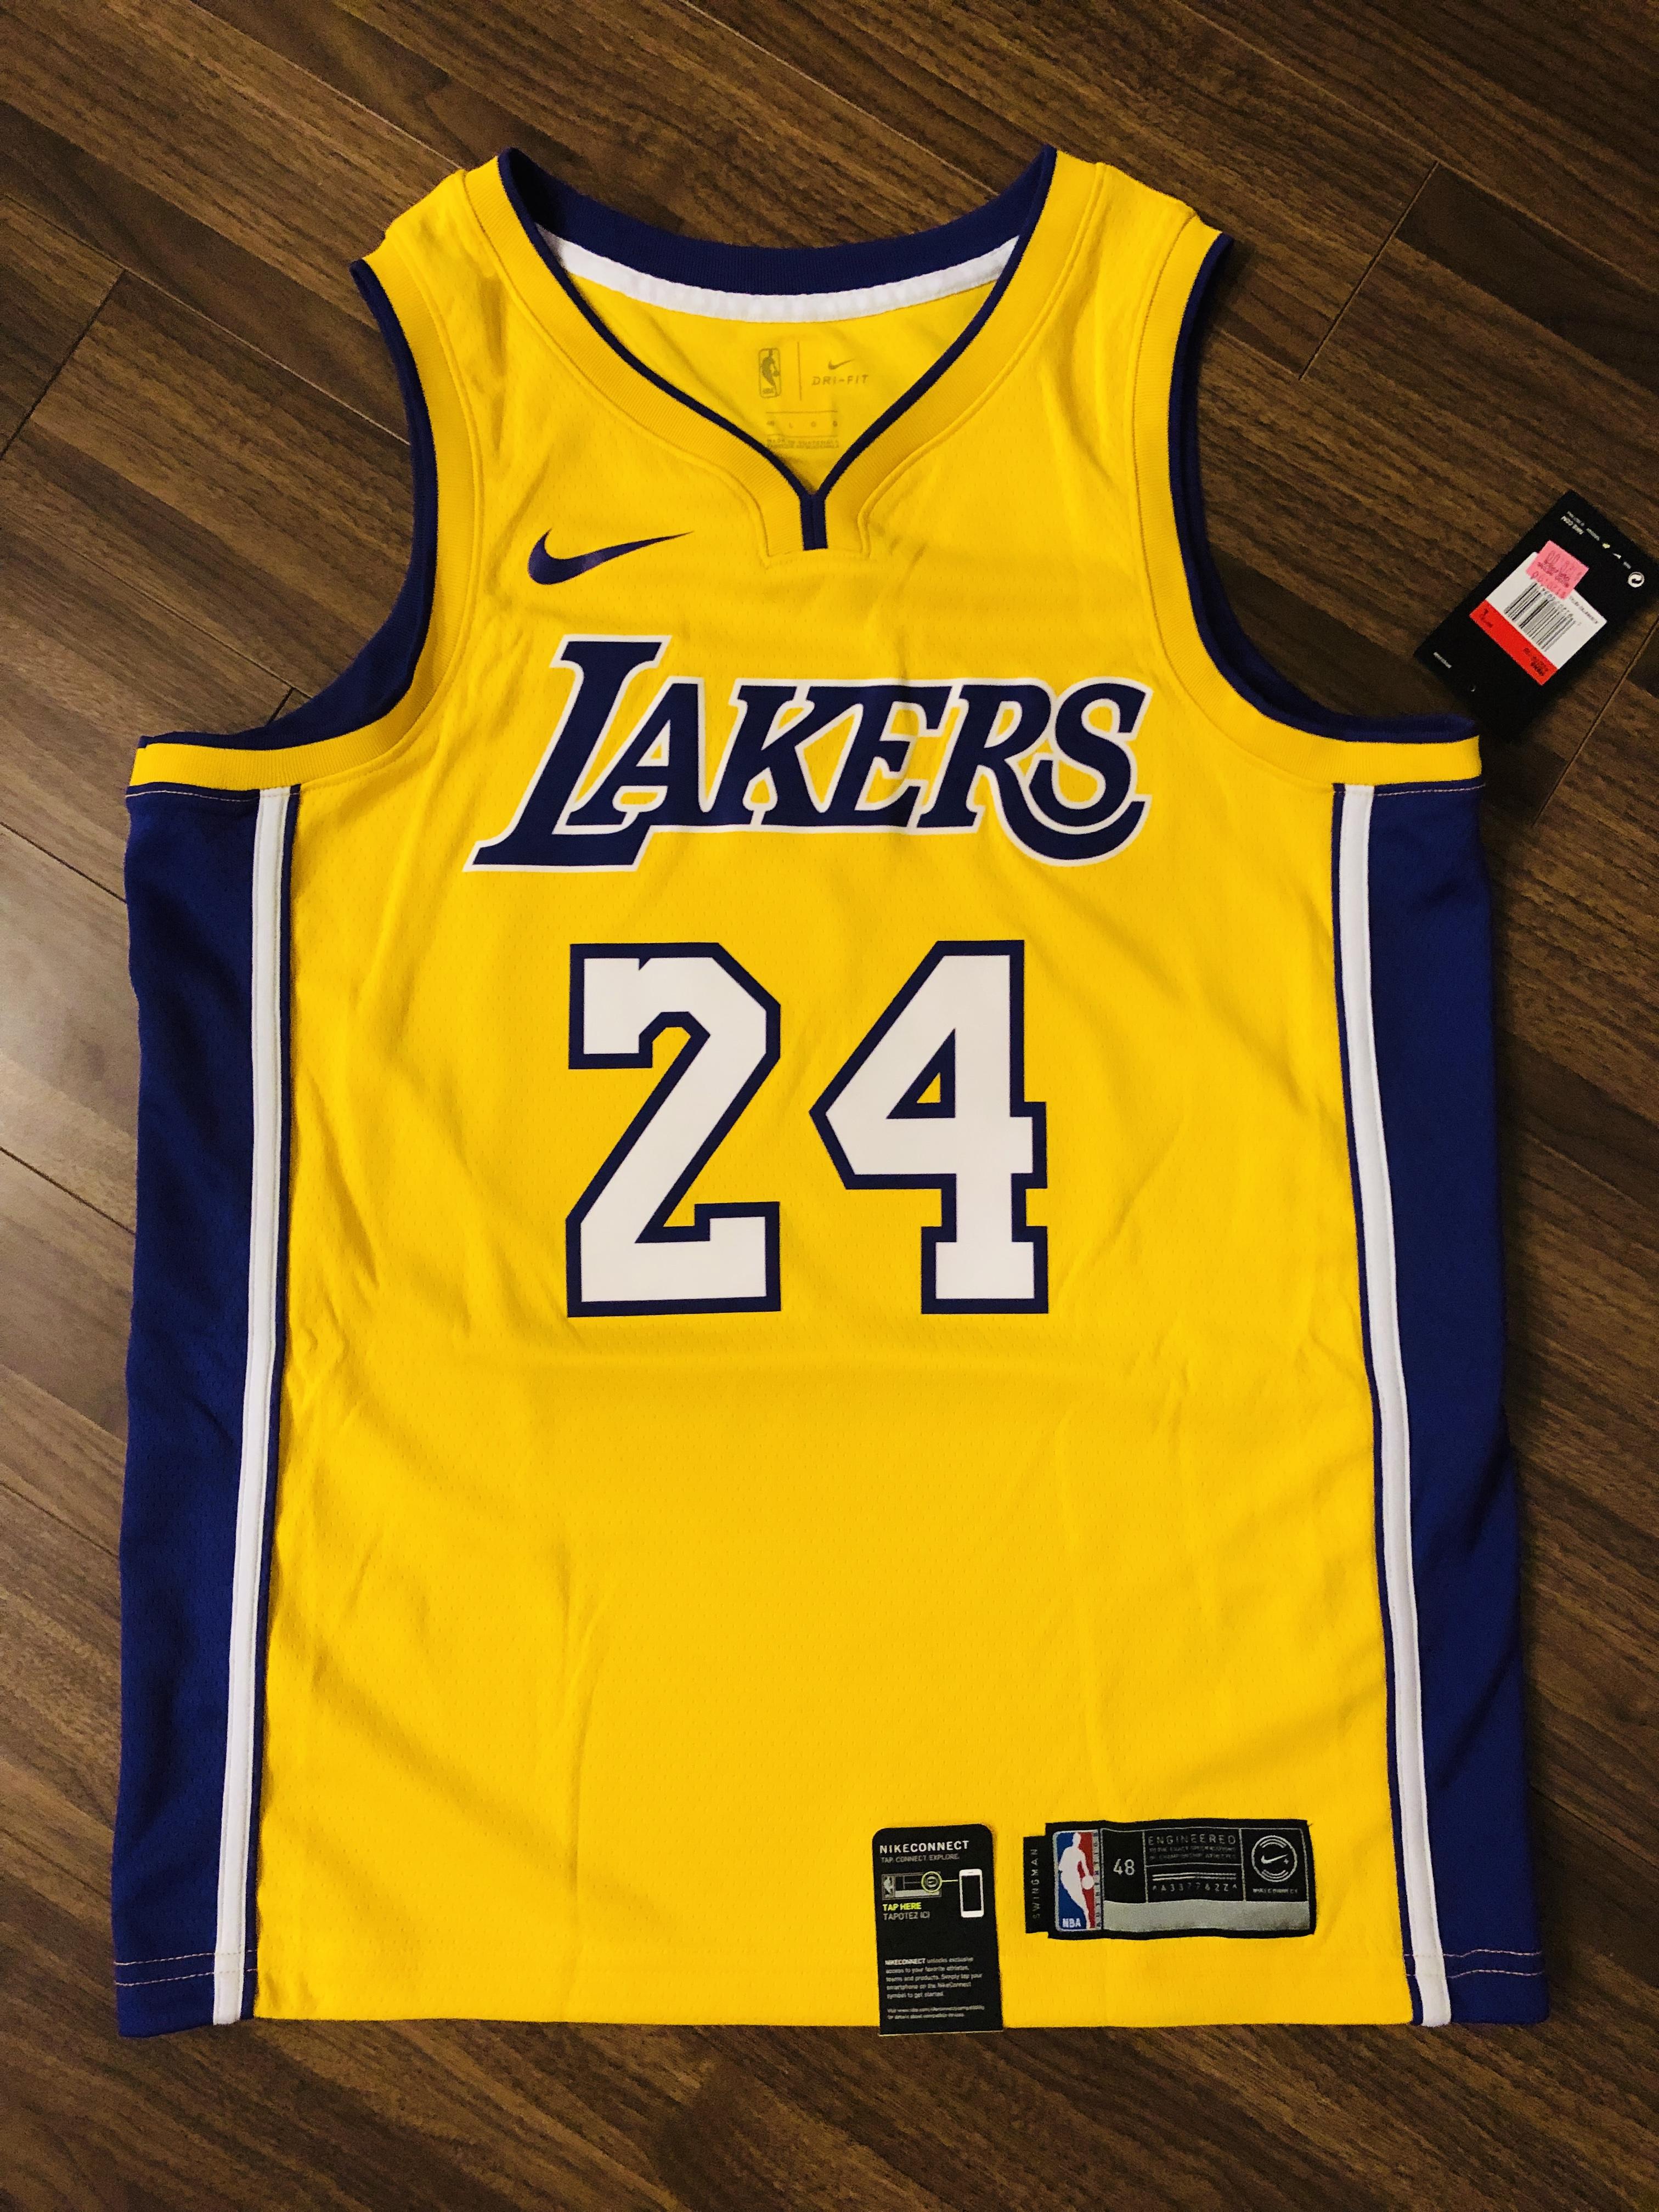 quality design ade7b e1624 Authentic Nike Kobe Bryant Swingman Lakers Jersey AQ2109-728, Size Large,  NWT